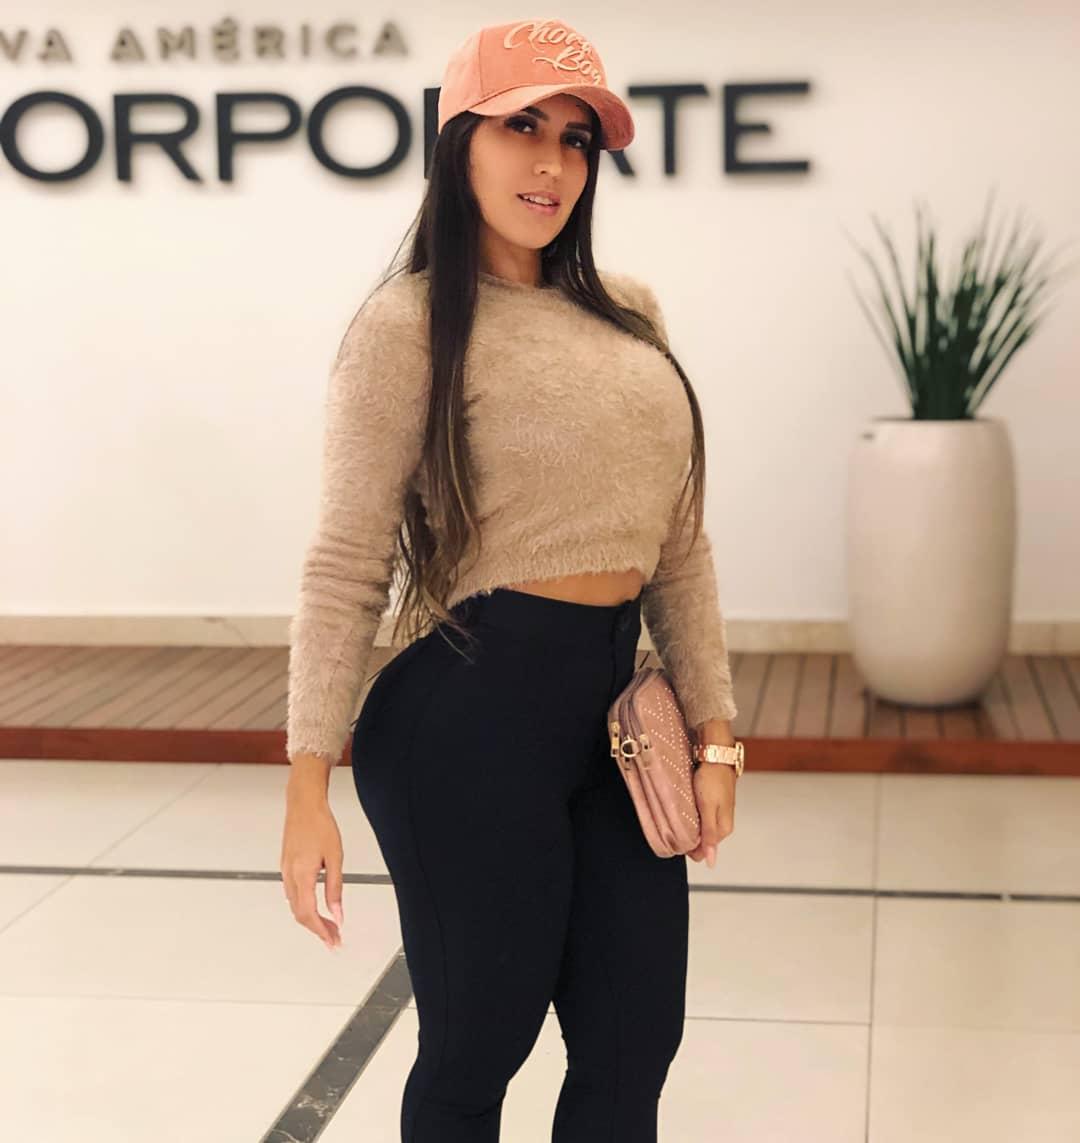 Amanda-Miguez-Wallpapers-Insta-Fit-Bio-2